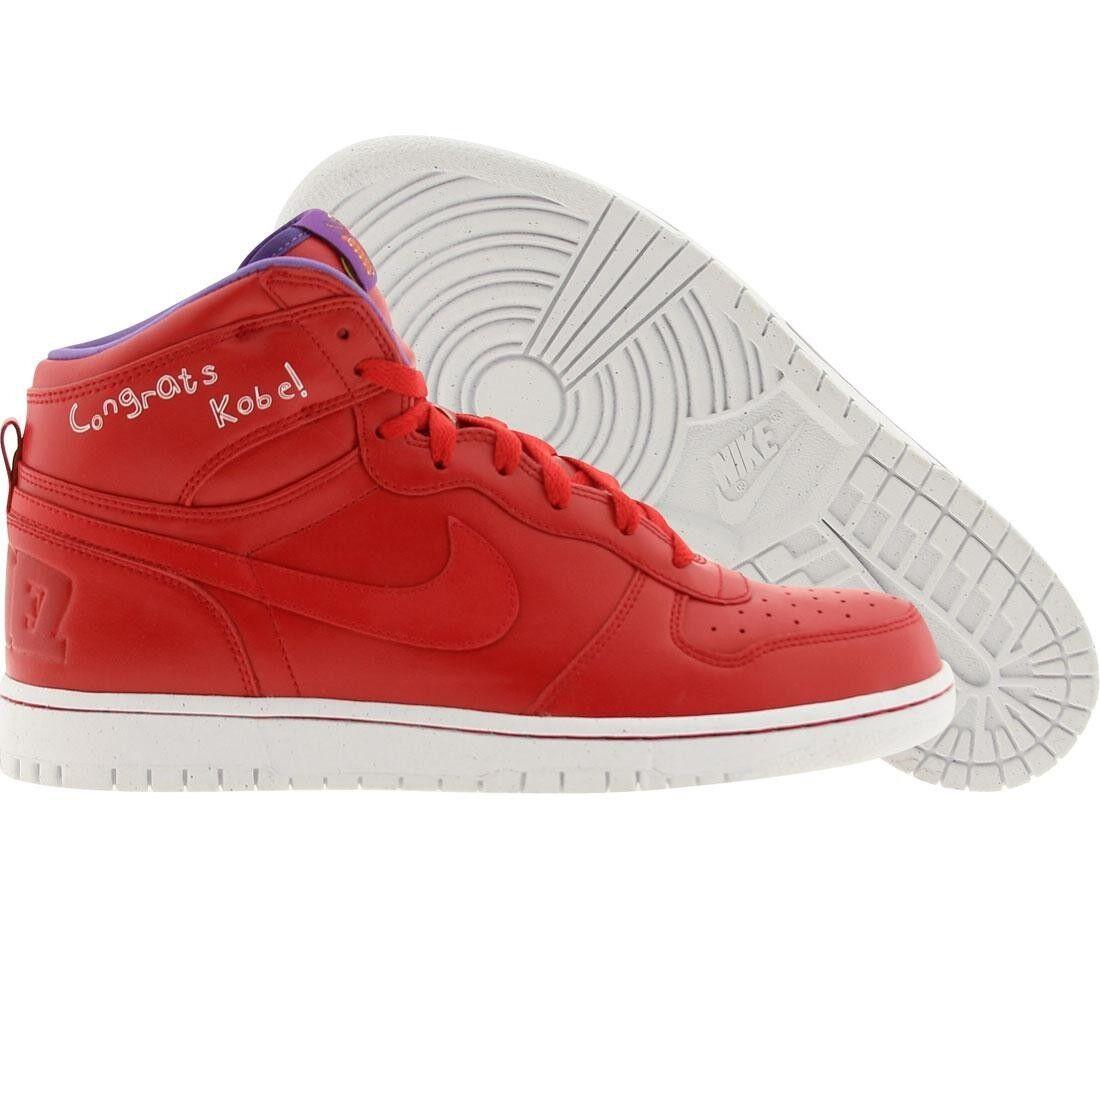 370428-600 Nike Hommes Big Nike High QK-Congrats Kobe Lil Dez (Rouge Sport Rouge